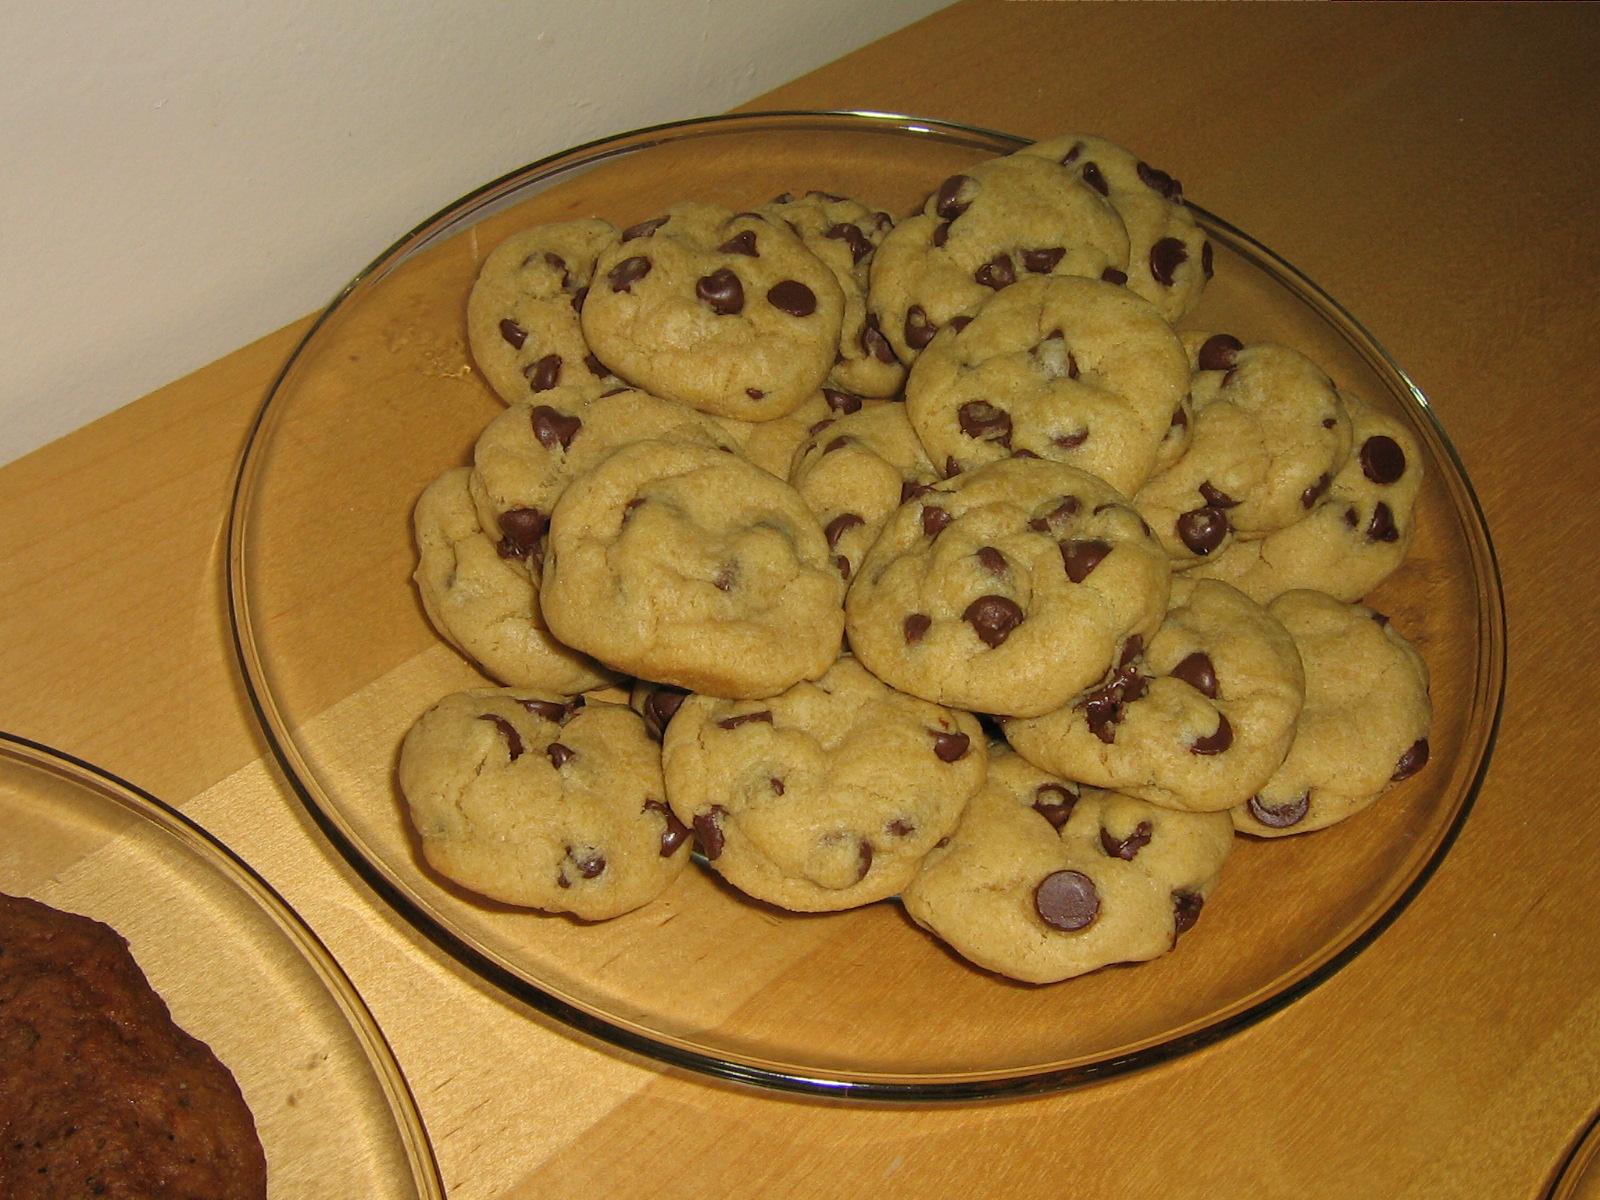 Two dozen fresh baked vegan chocolate chip cookies. Another 13 cookies ...